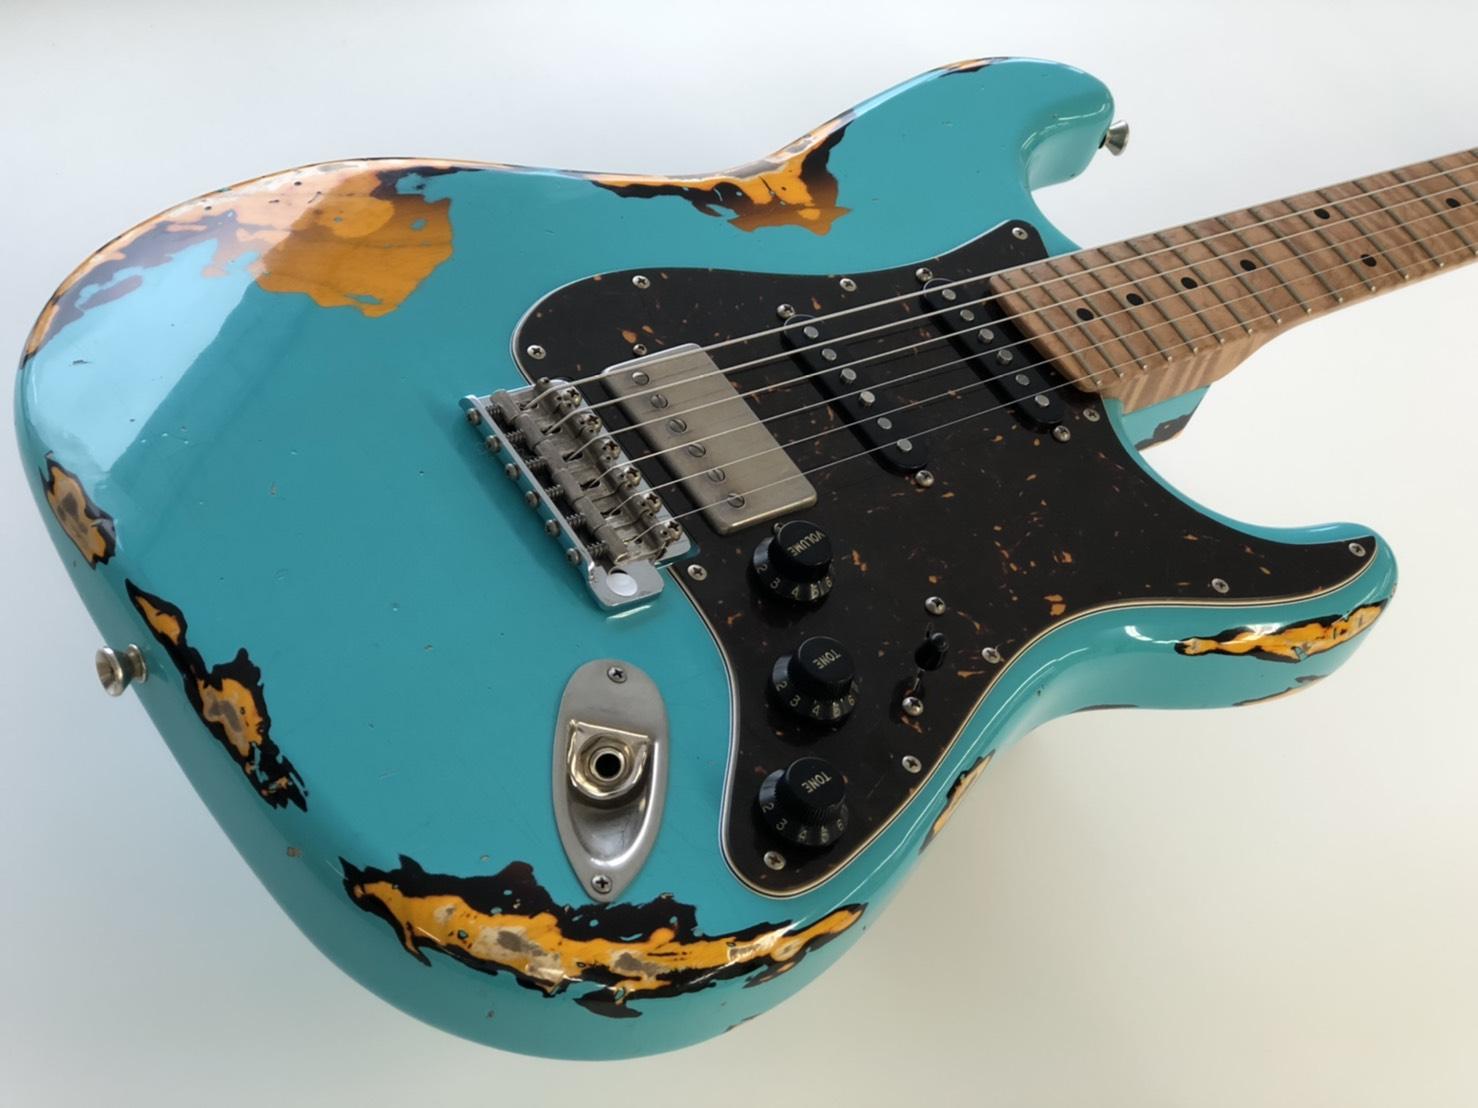 XOTIC XSC-2 /SEA FORM GREEN OVER 2TONE BURST /HEAVY AGED /ASH RM-RM /エギゾティック/エレキギター